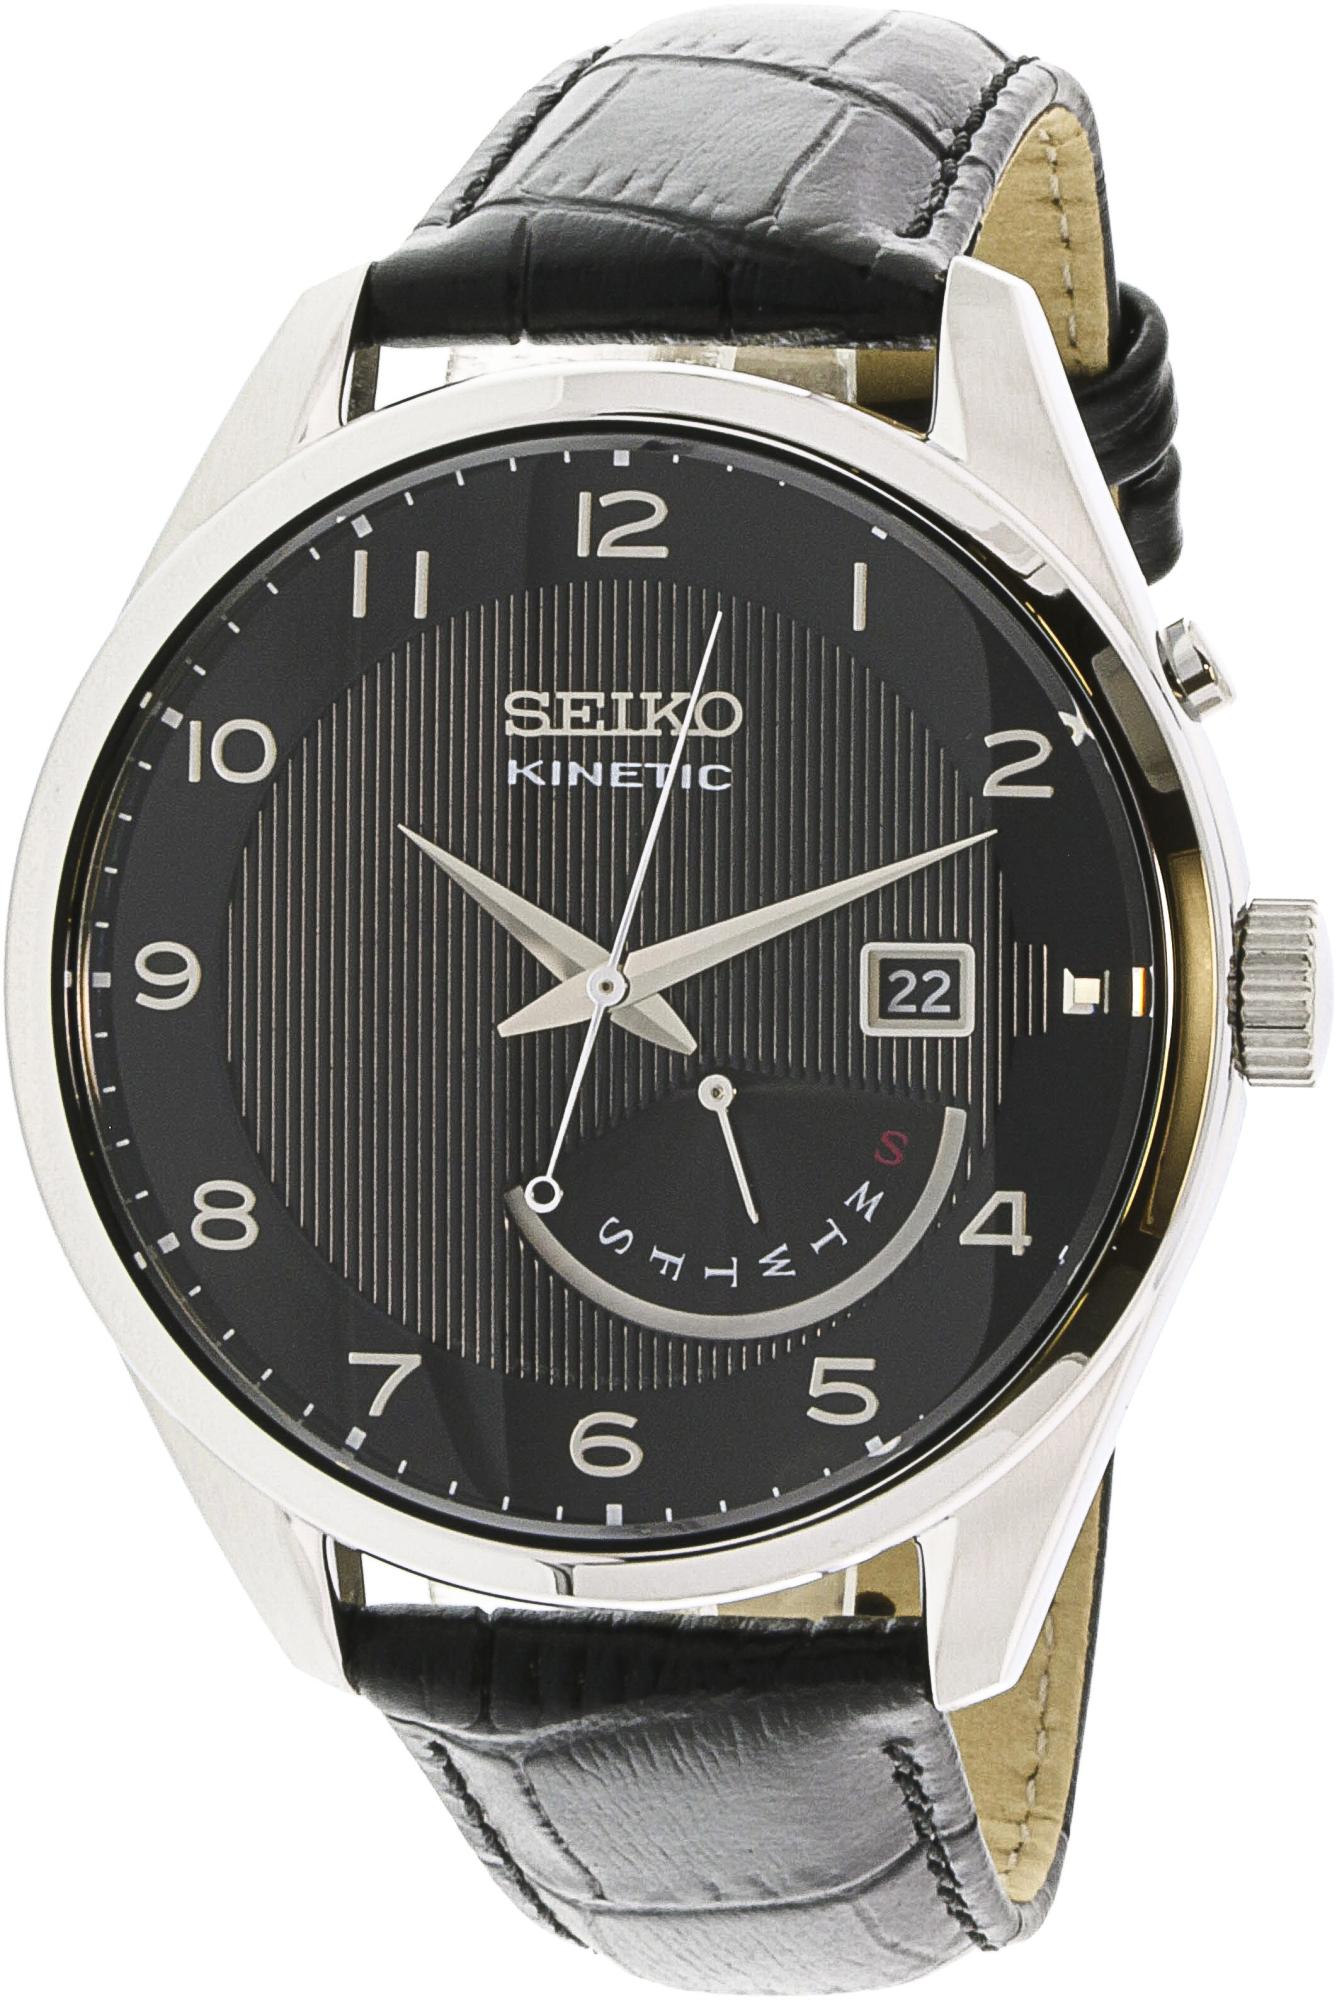 Seiko_Men's_Kinetic_SRN051_Black_Leather_Quartz_Fashion_Watch